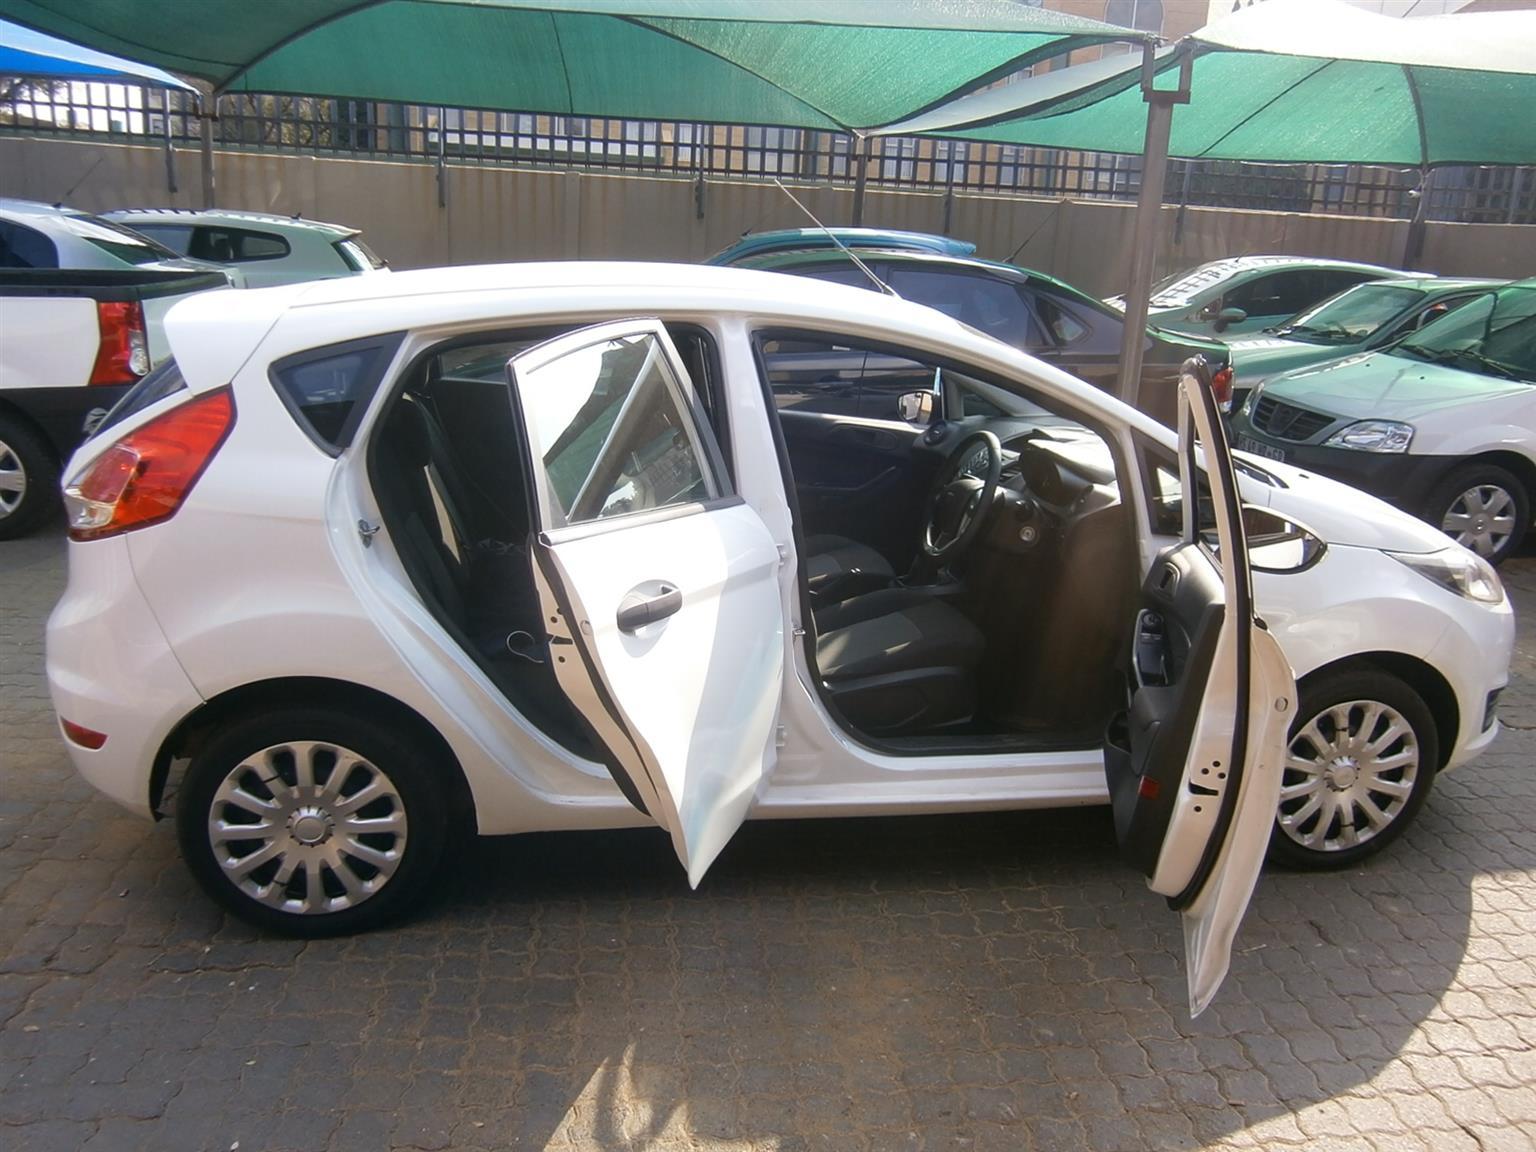 2017 Ford Fiesta 1.4 5 door Ambiente